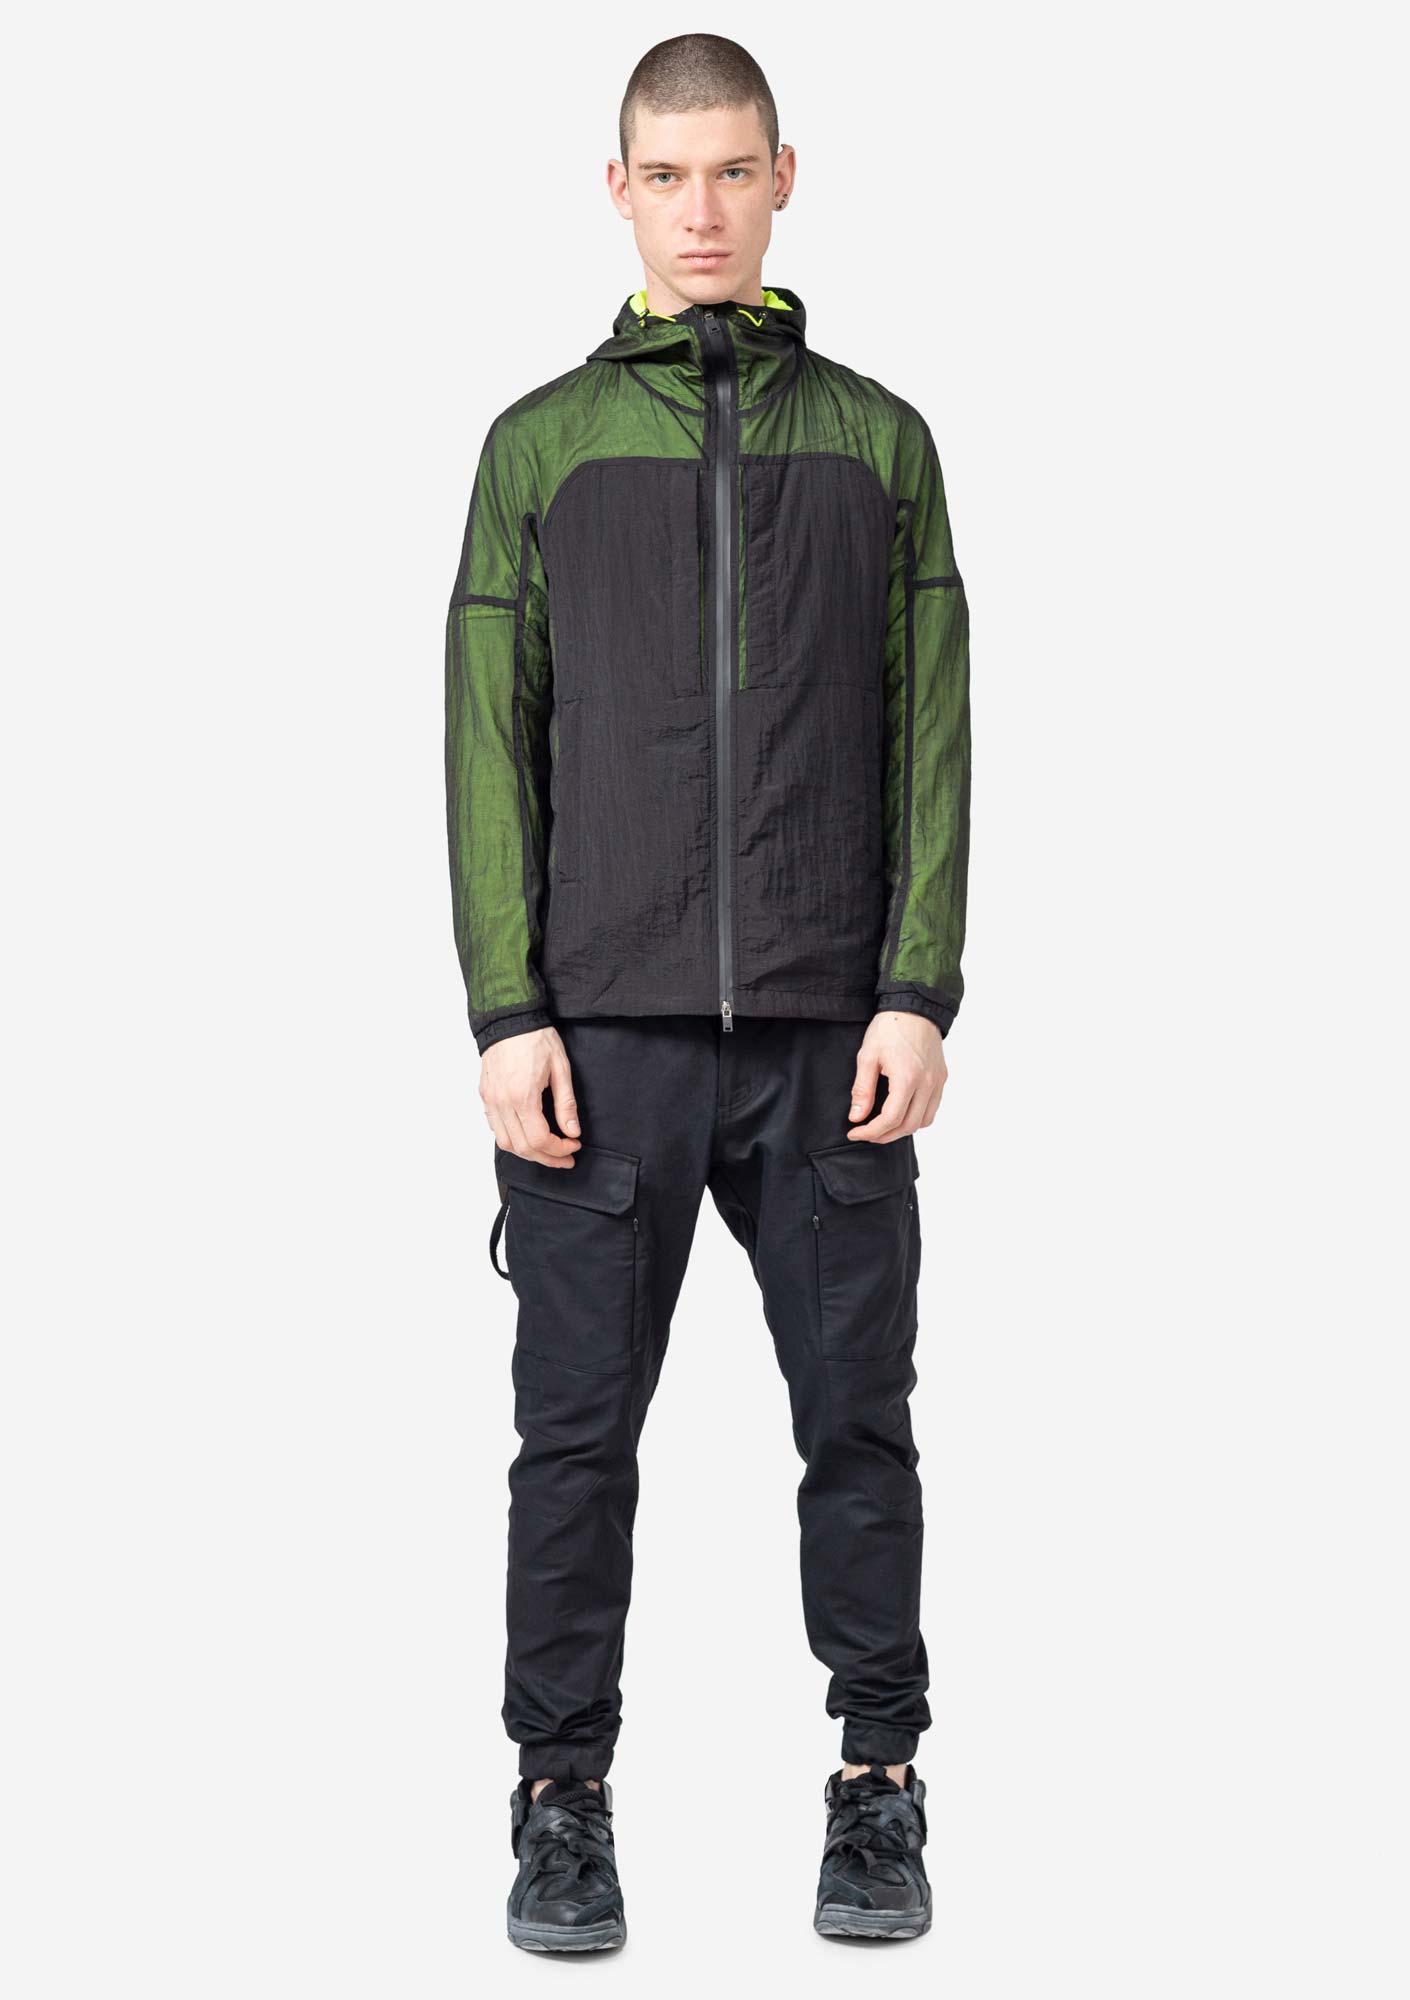 Полупрозрачная куртка  KRAKATAU F46/19